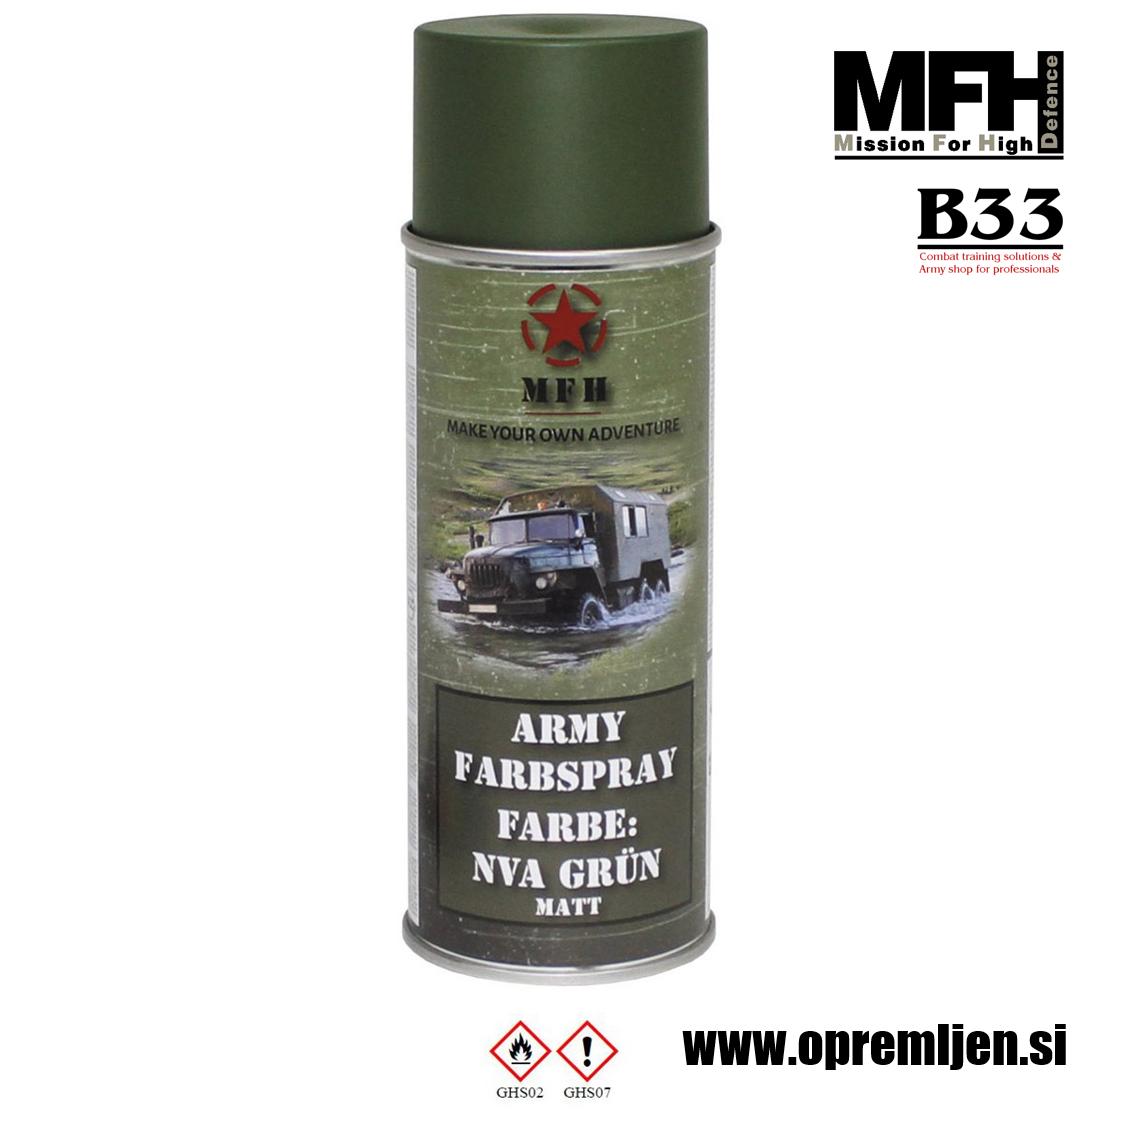 Vojaška barva sprej zelena NVA GREEN RAL6003 400ml MFH - Max Fuchs by B33 army shop at www.opremljen.s